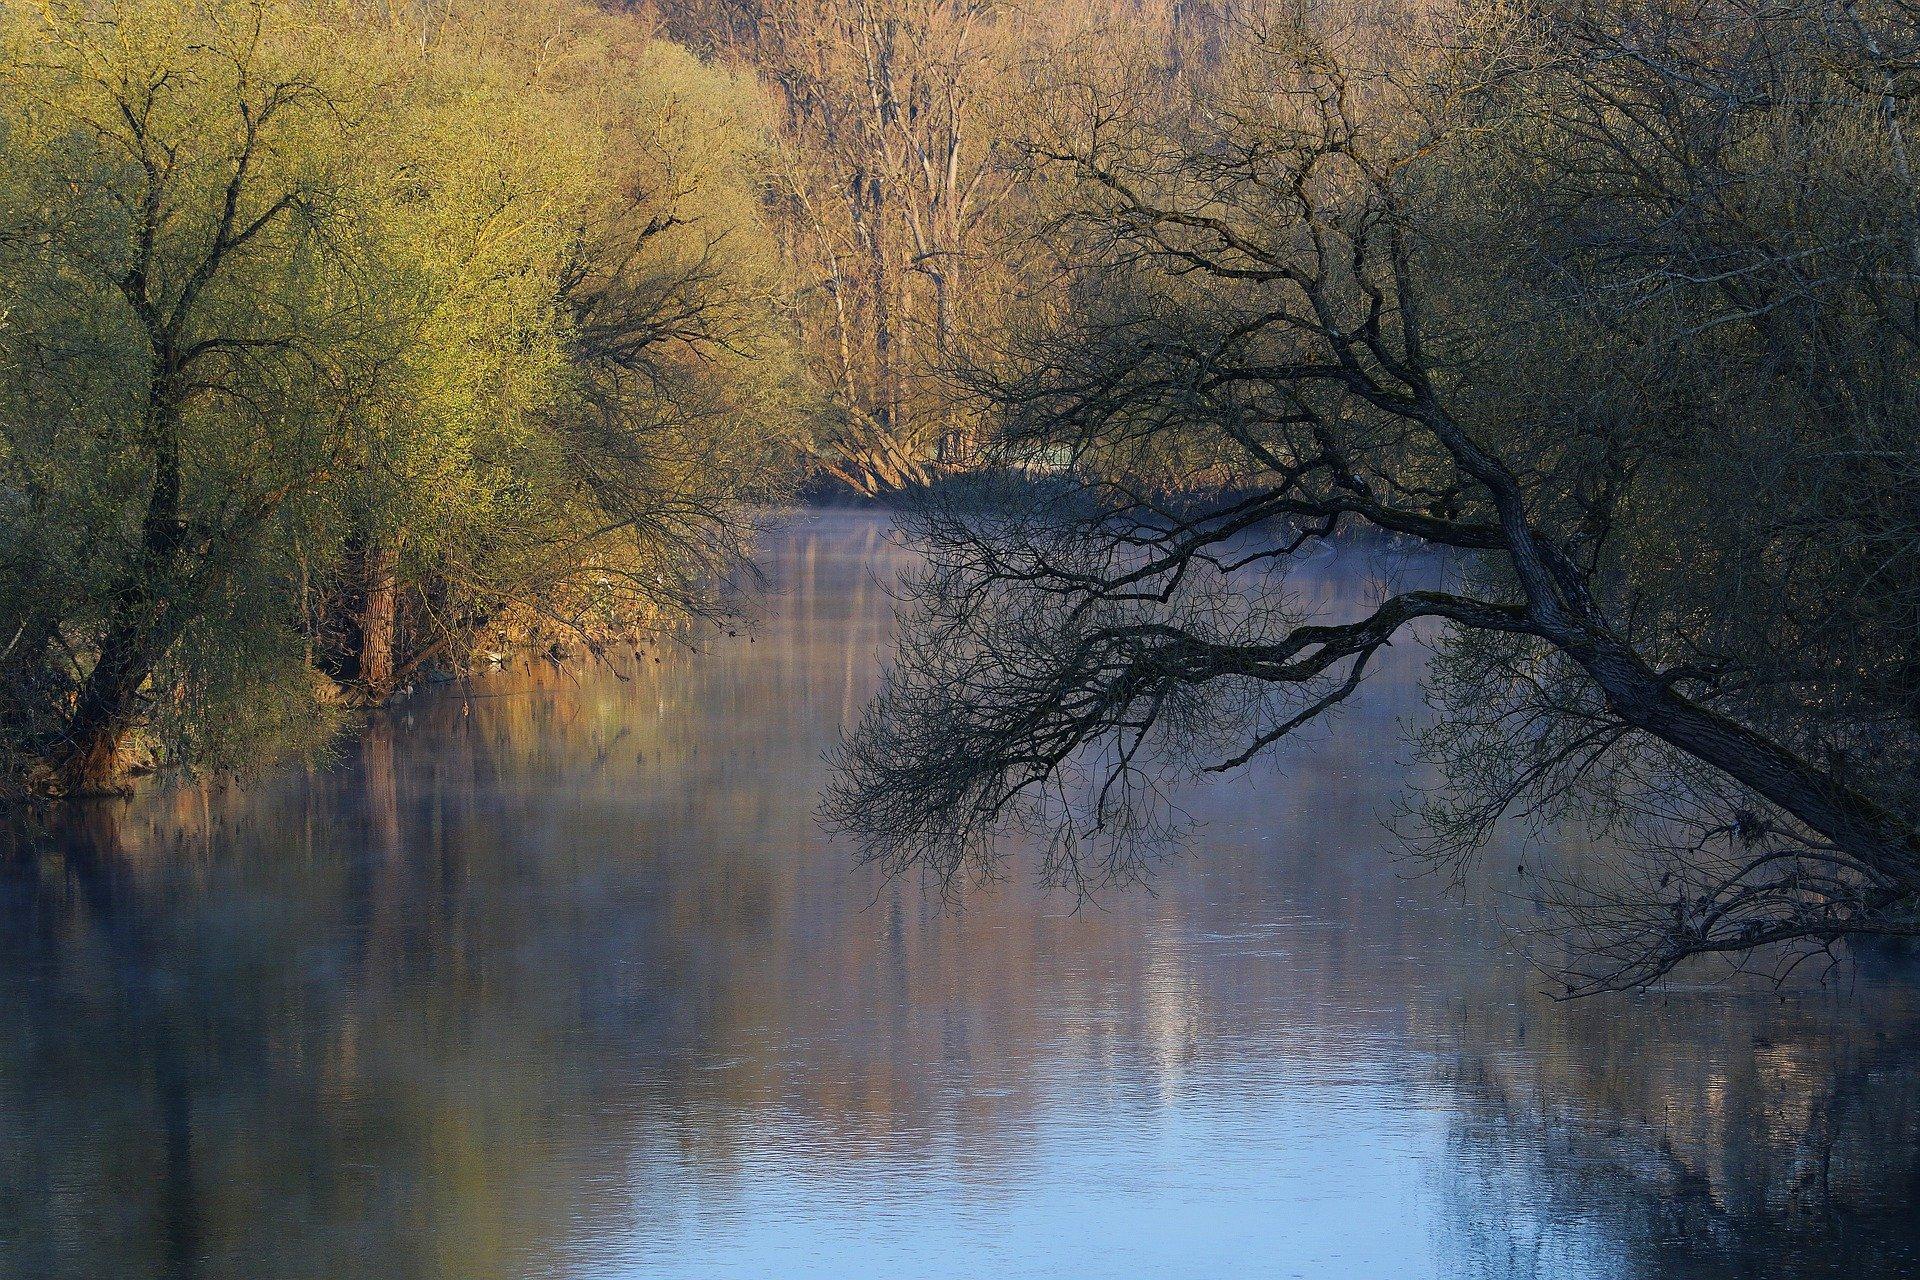 Floodplain Management Program